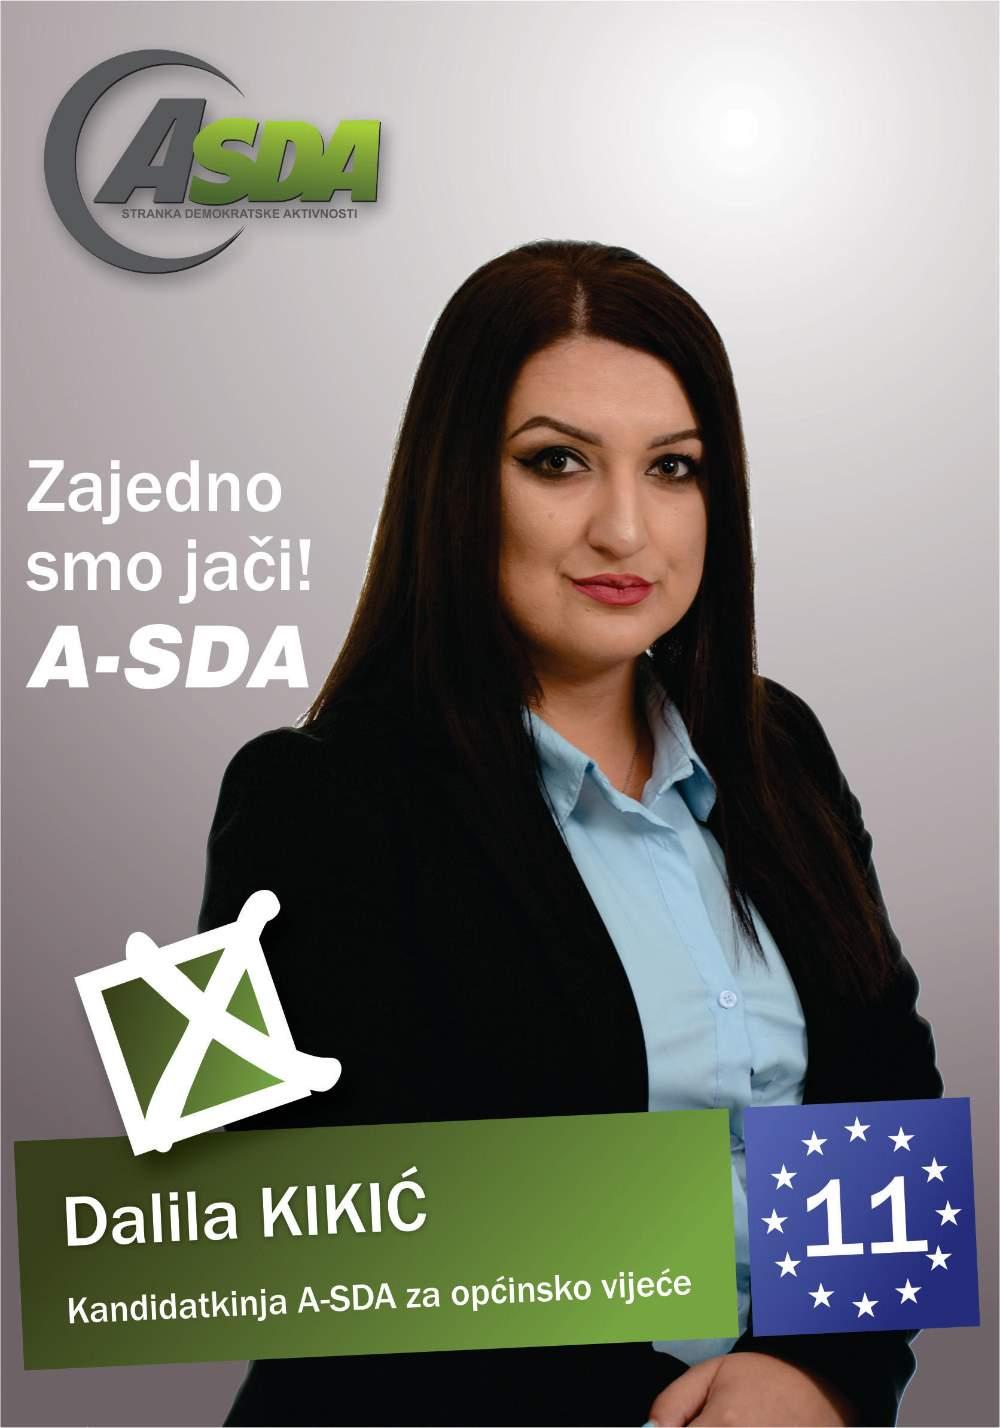 Dalila Kikić